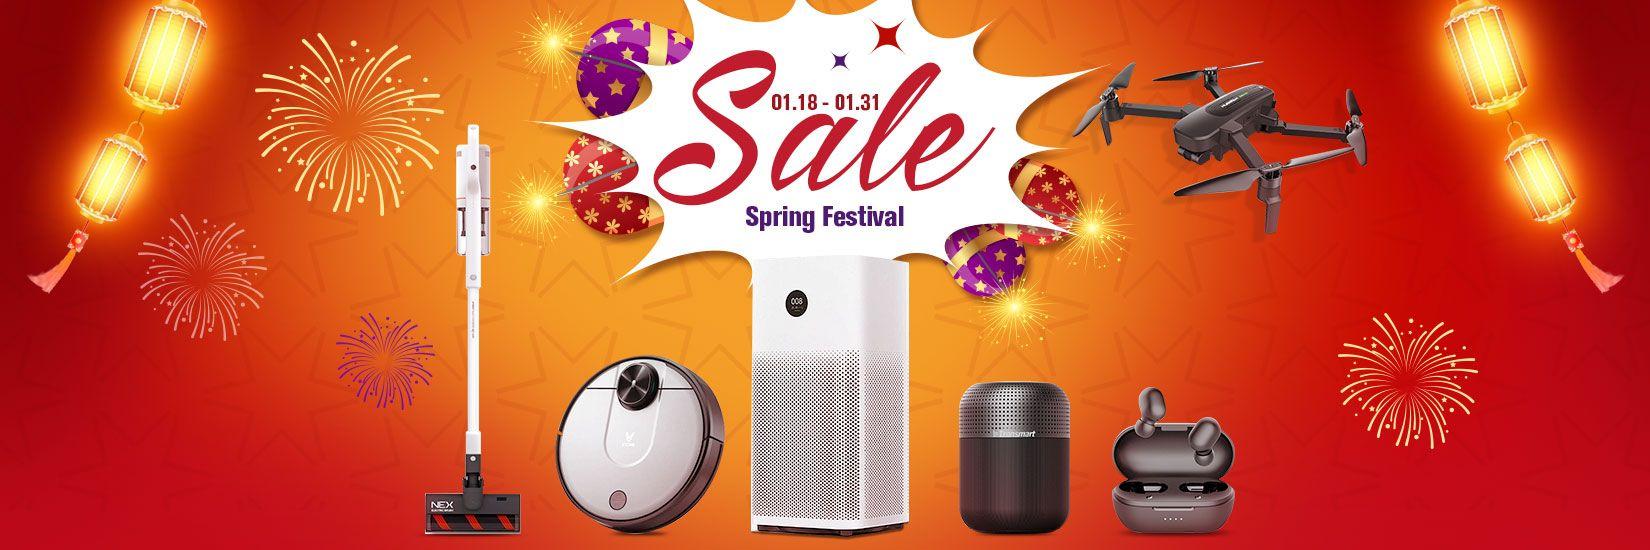 Spring Festival Sale